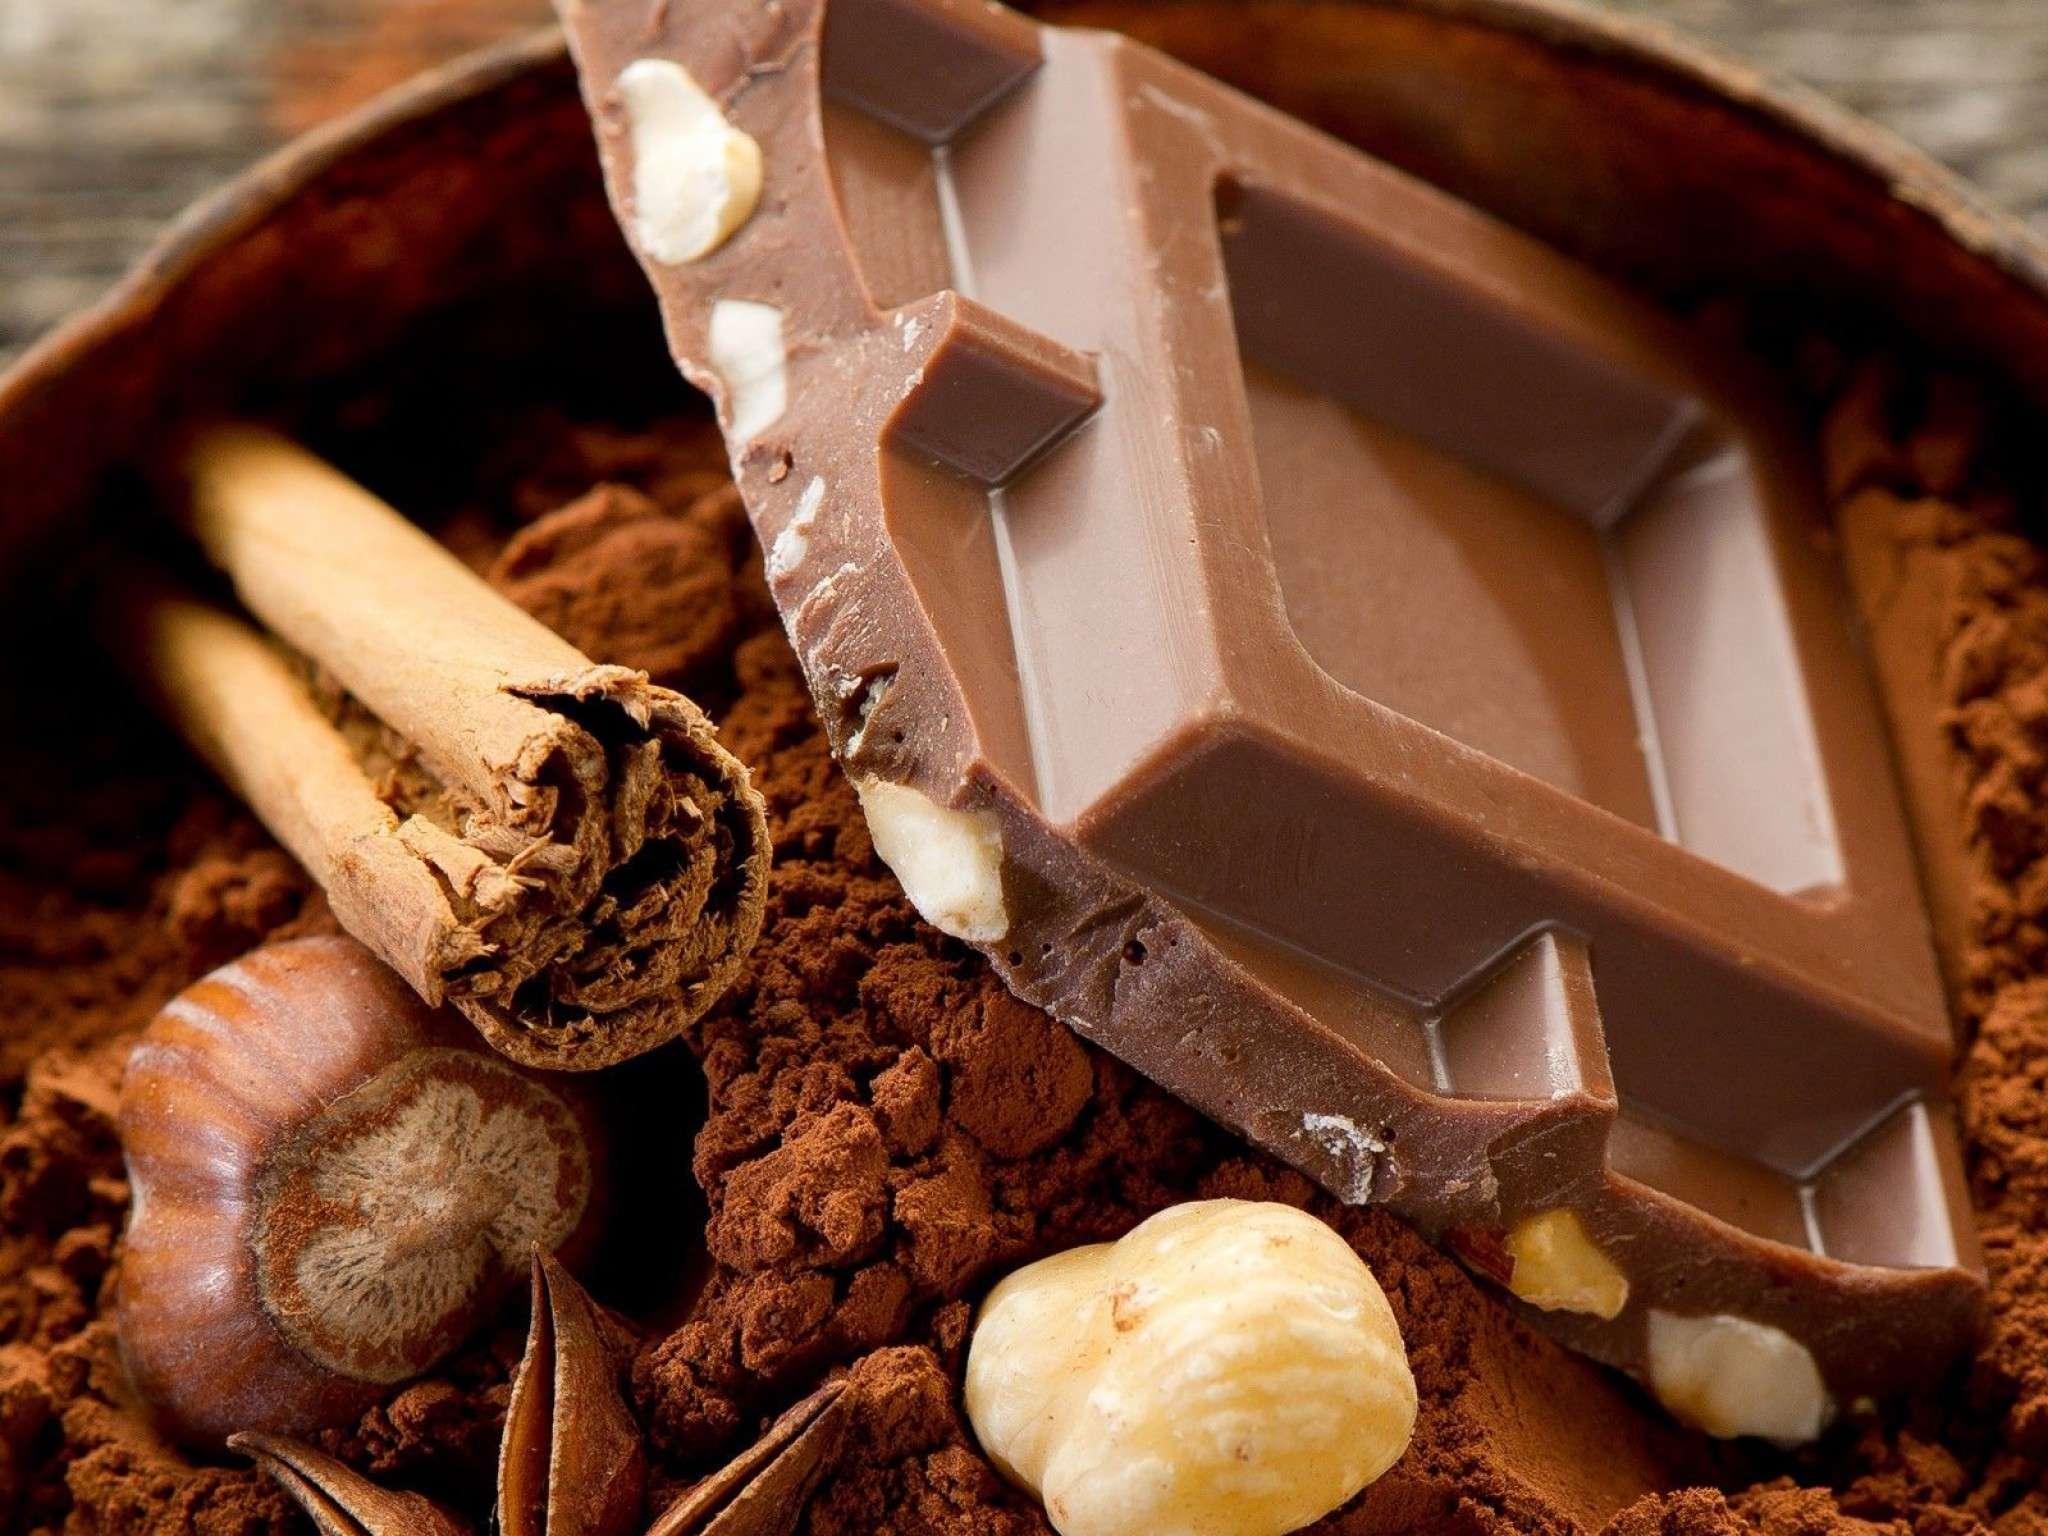 Россияне не откажутся от шоколада